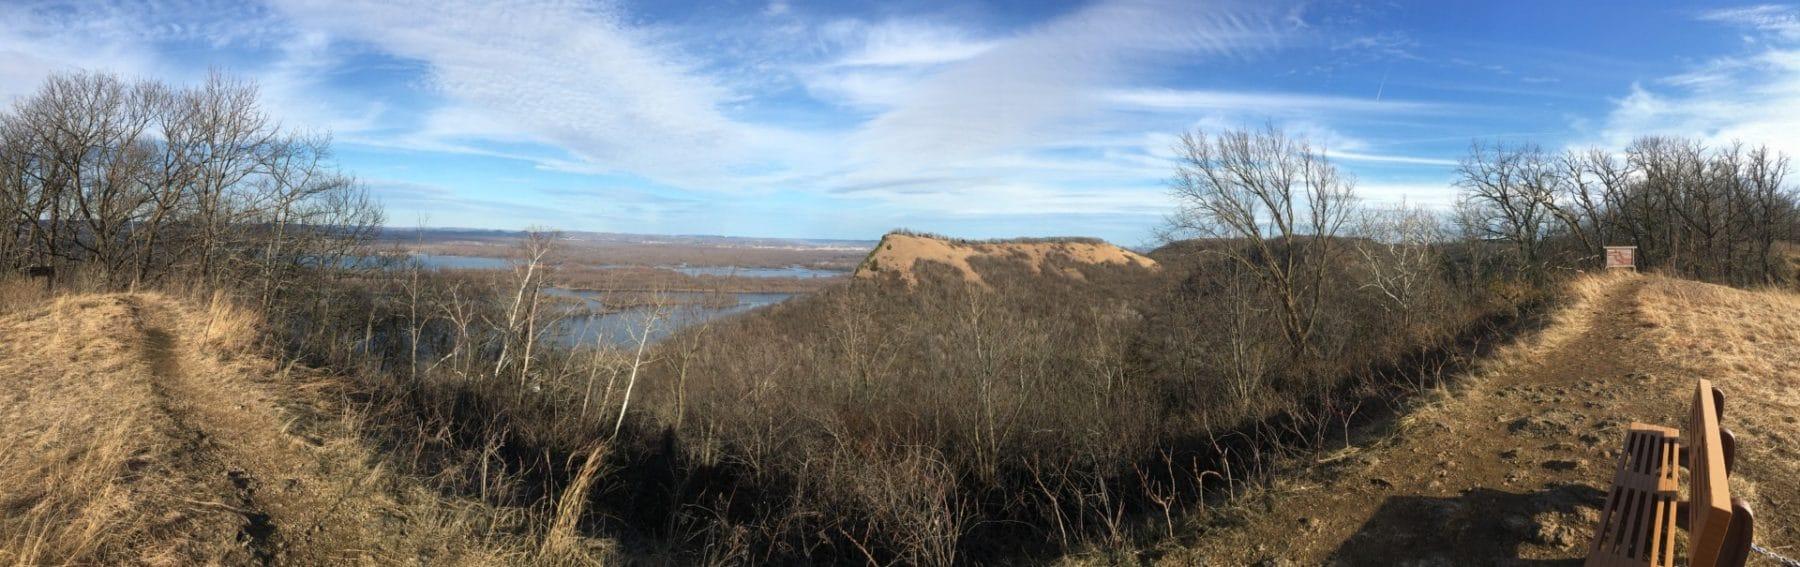 Hiking Kings bluff trail